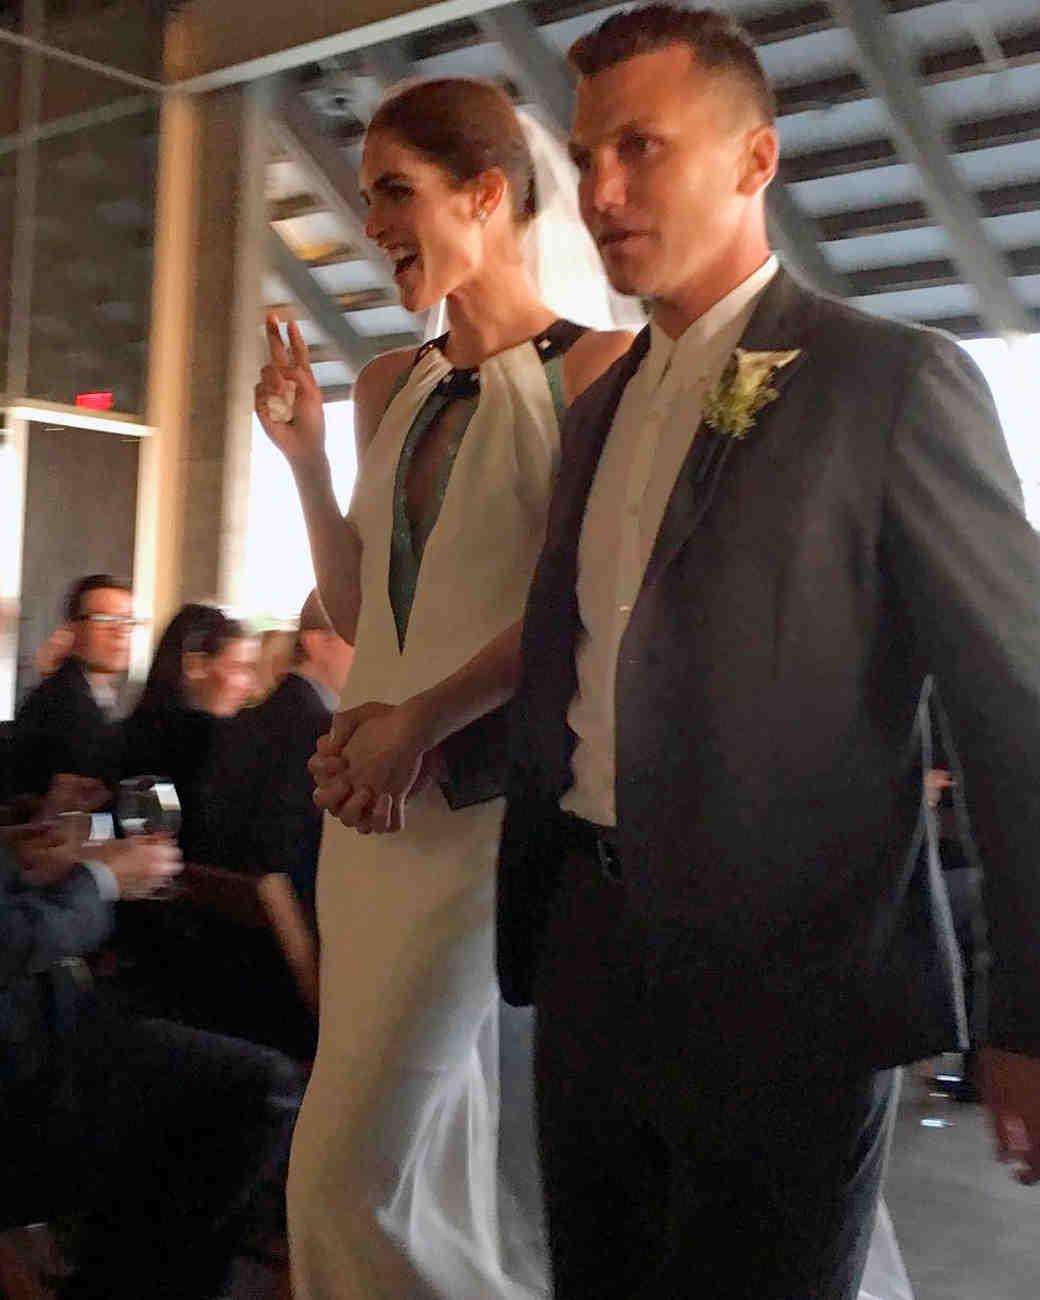 celebrity-wedding-moments-hilary-rhoda-sean-avery-1215.jpg